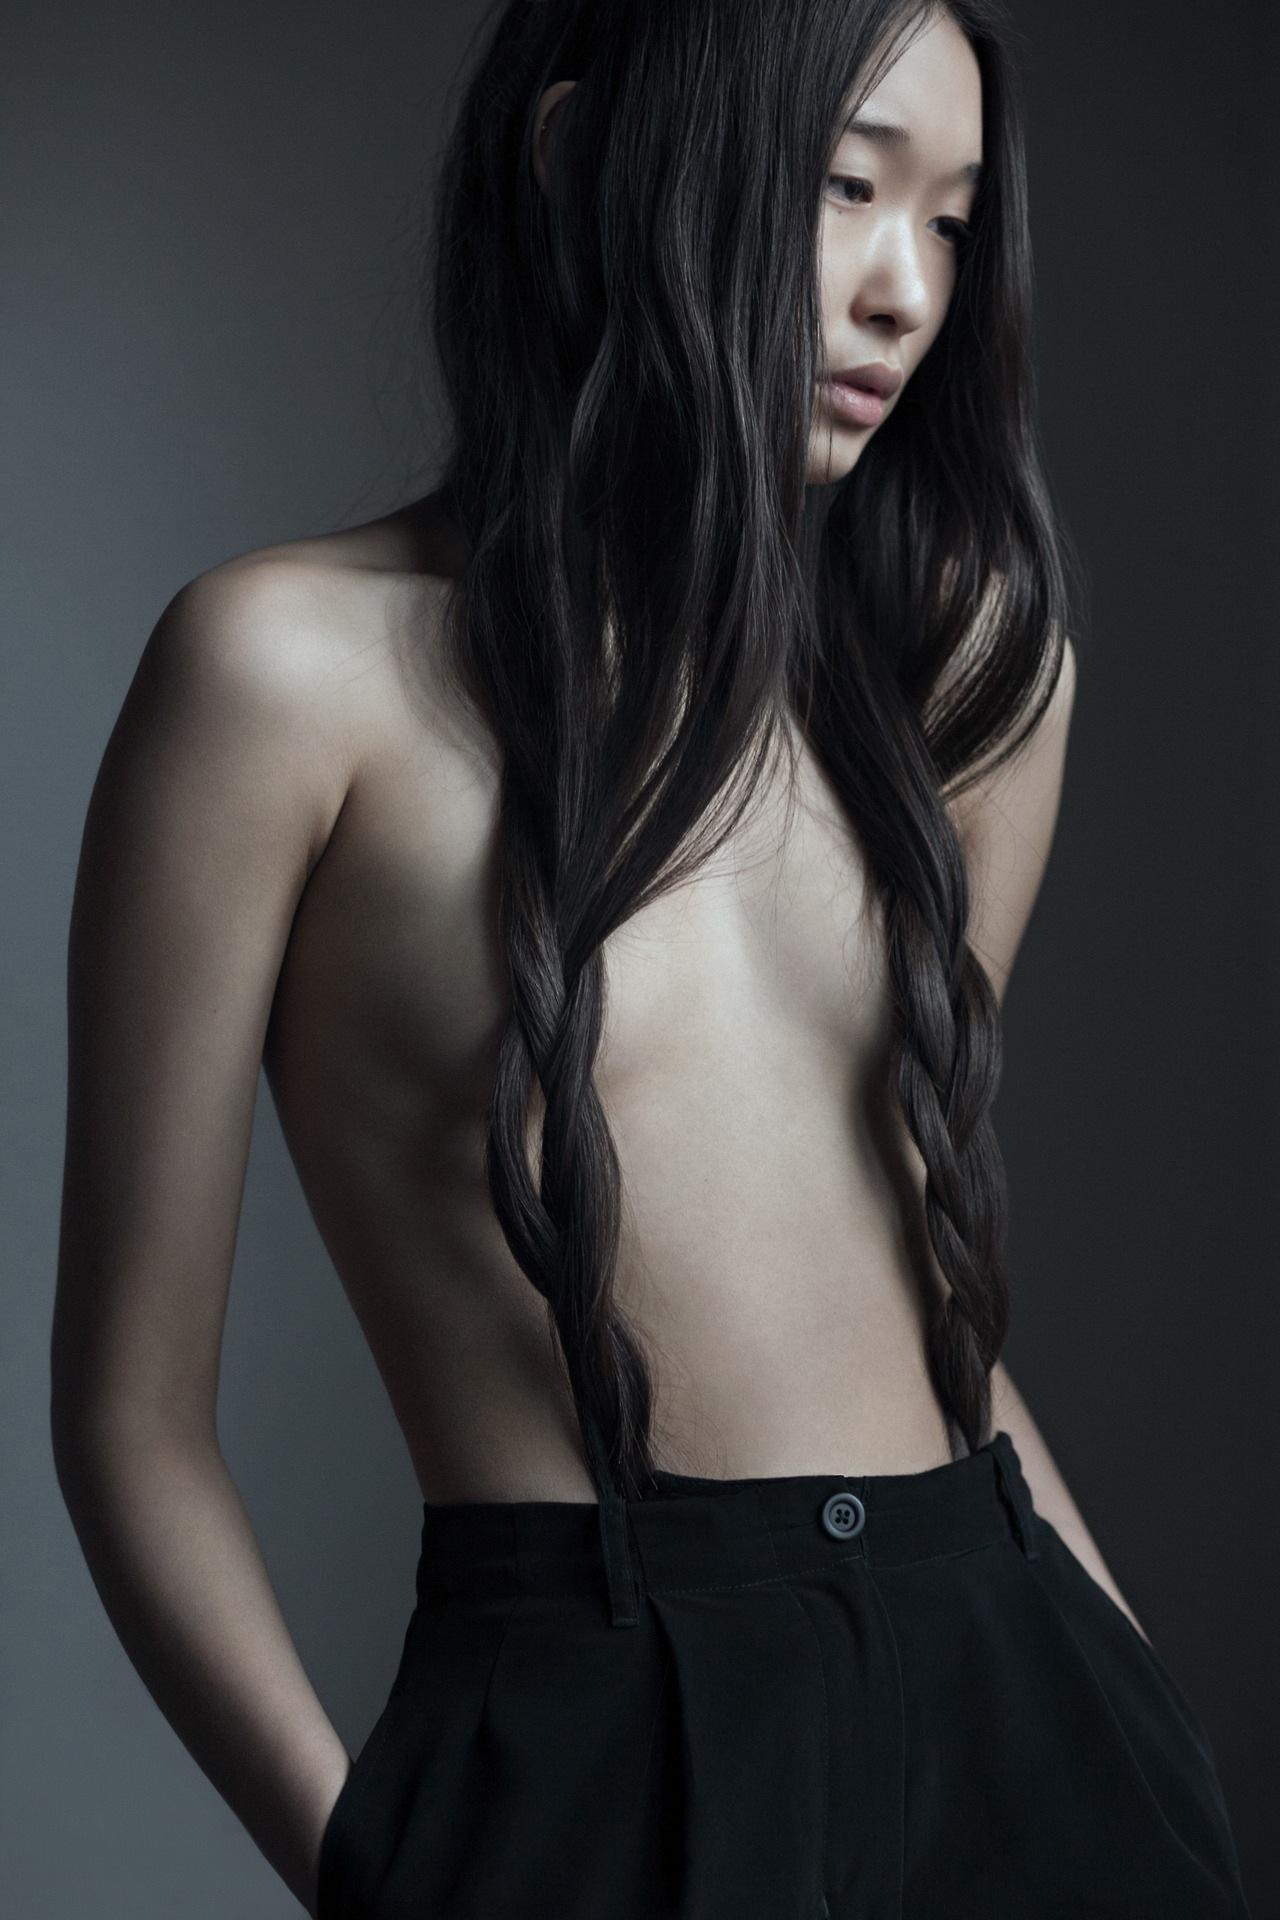 Bibi_Sharipova-Jens_Ingvarsson-01.jpeg